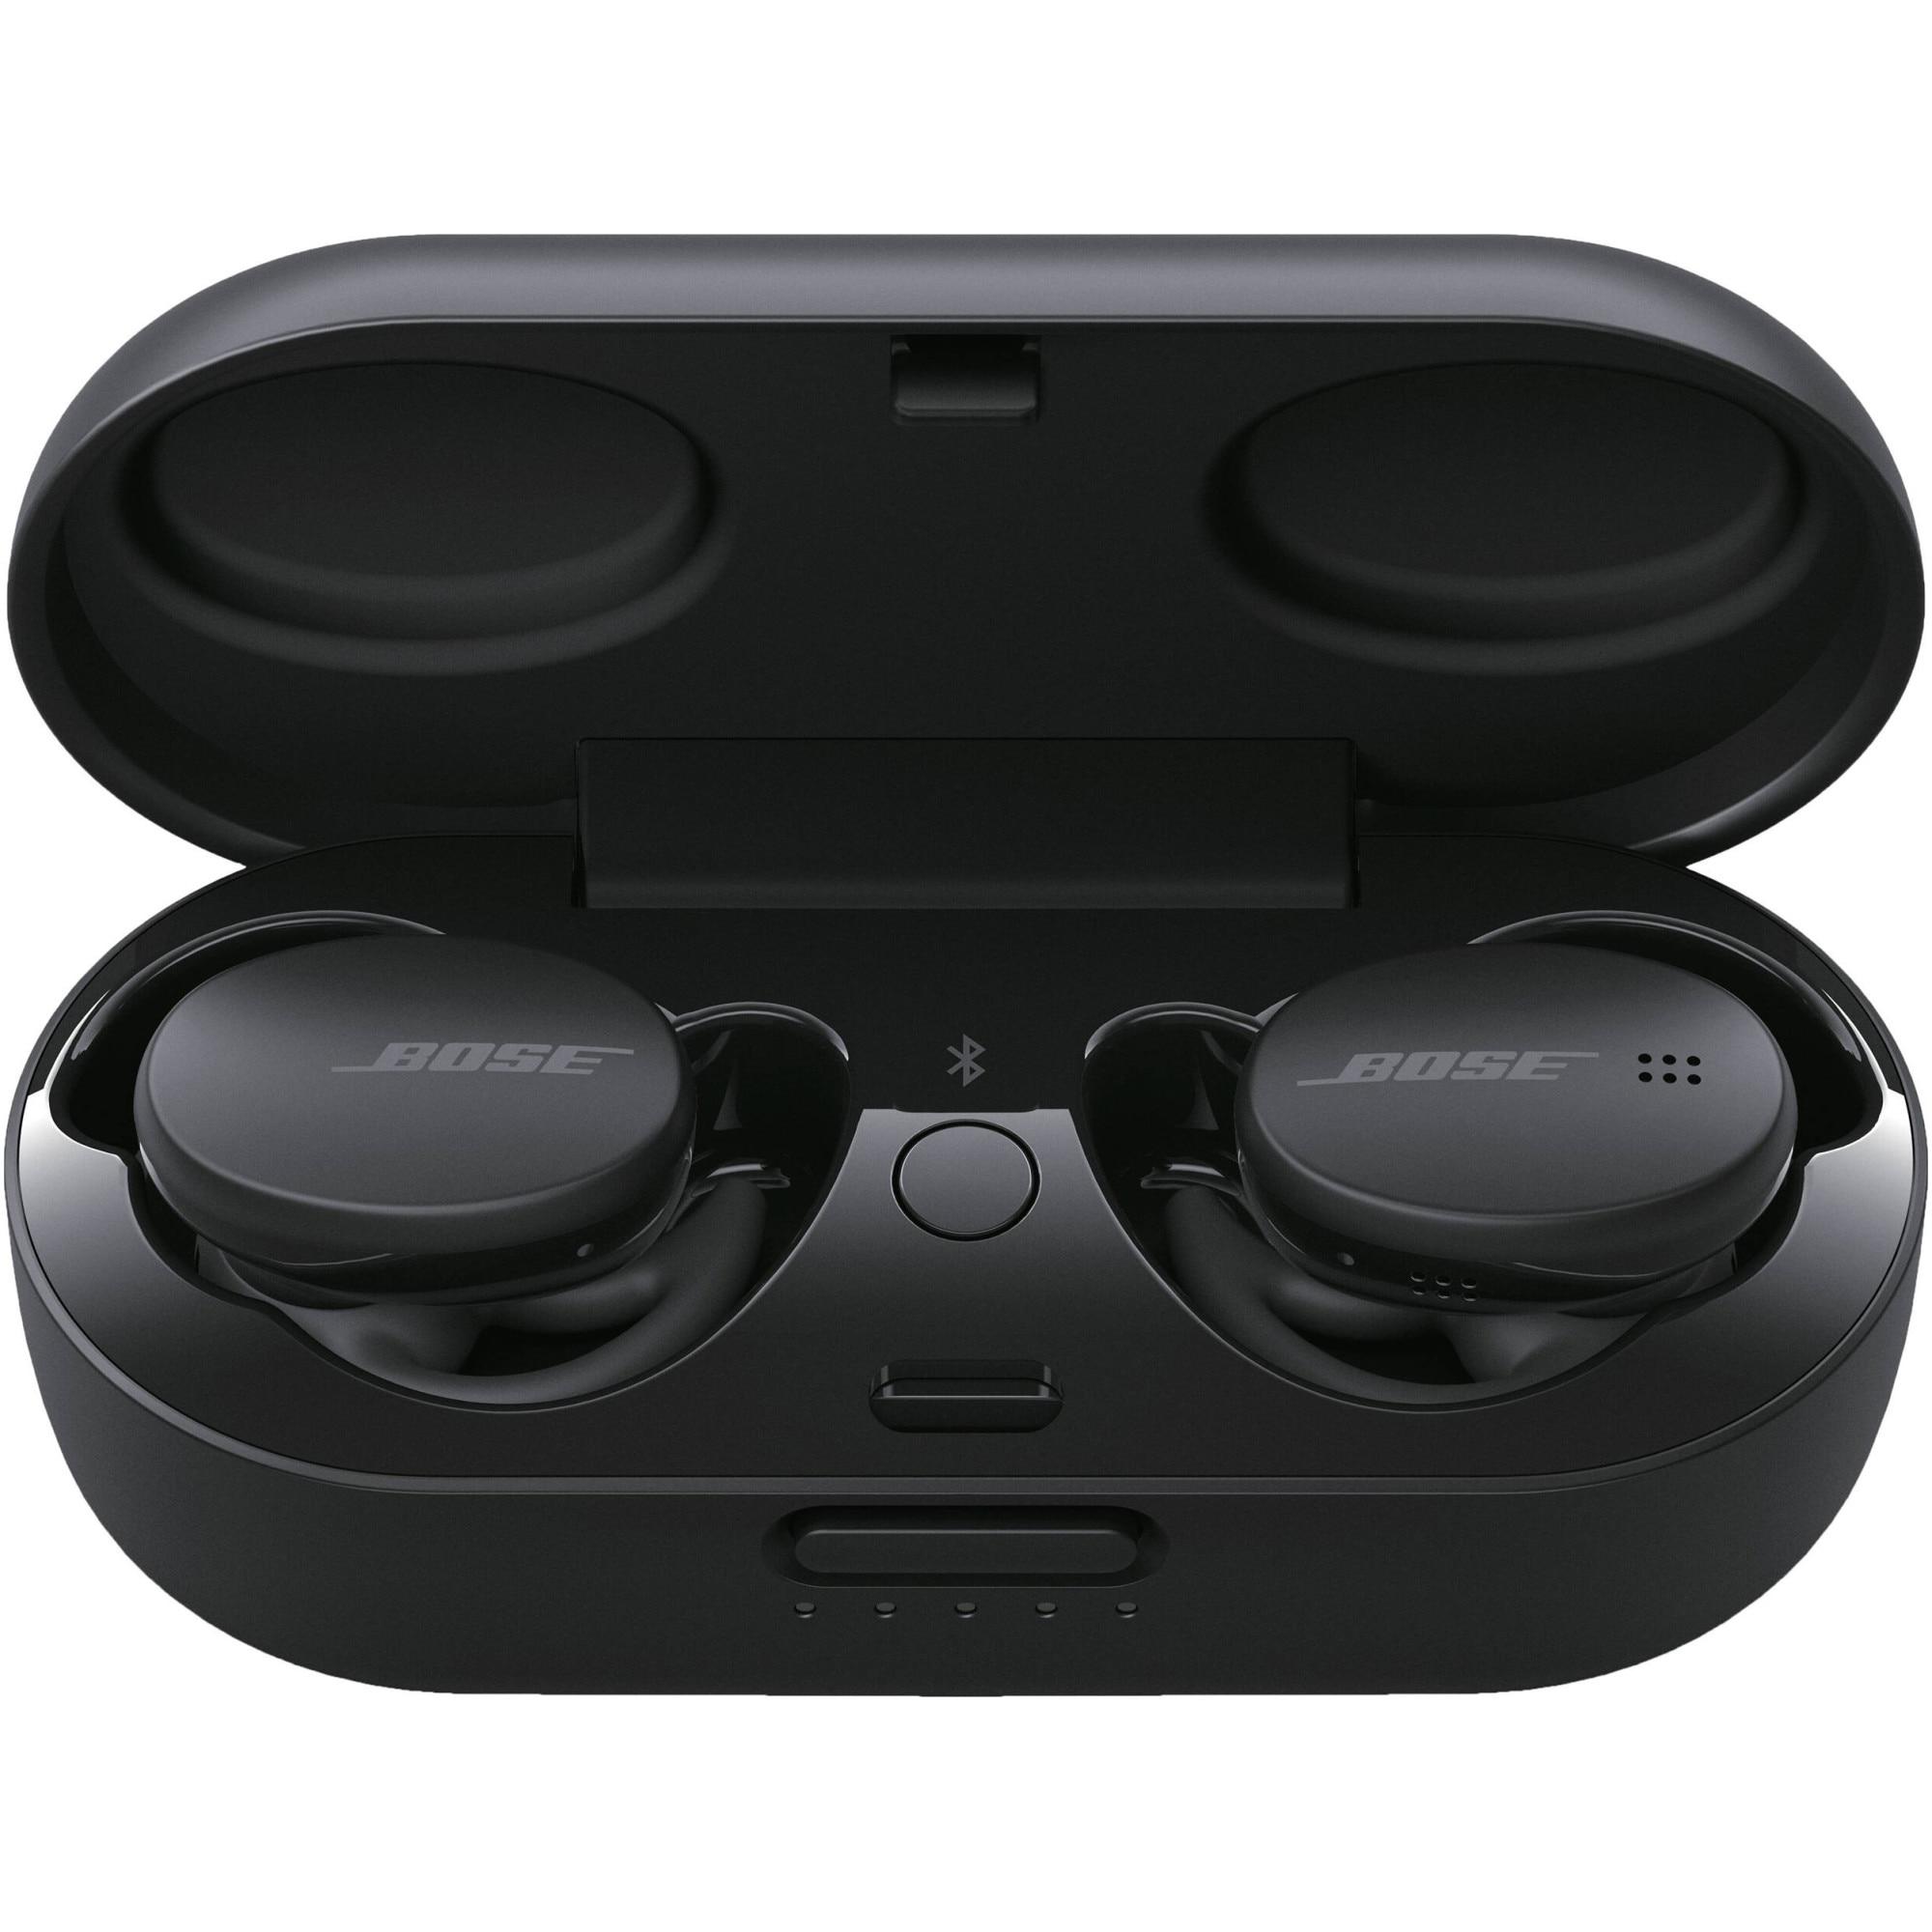 Fotografie Casti Audio Sport In Ear Bose Earbuds, True Wireless, Bluetooth, Noise cancelling, Microfon, Autonomie 5 ore, Black